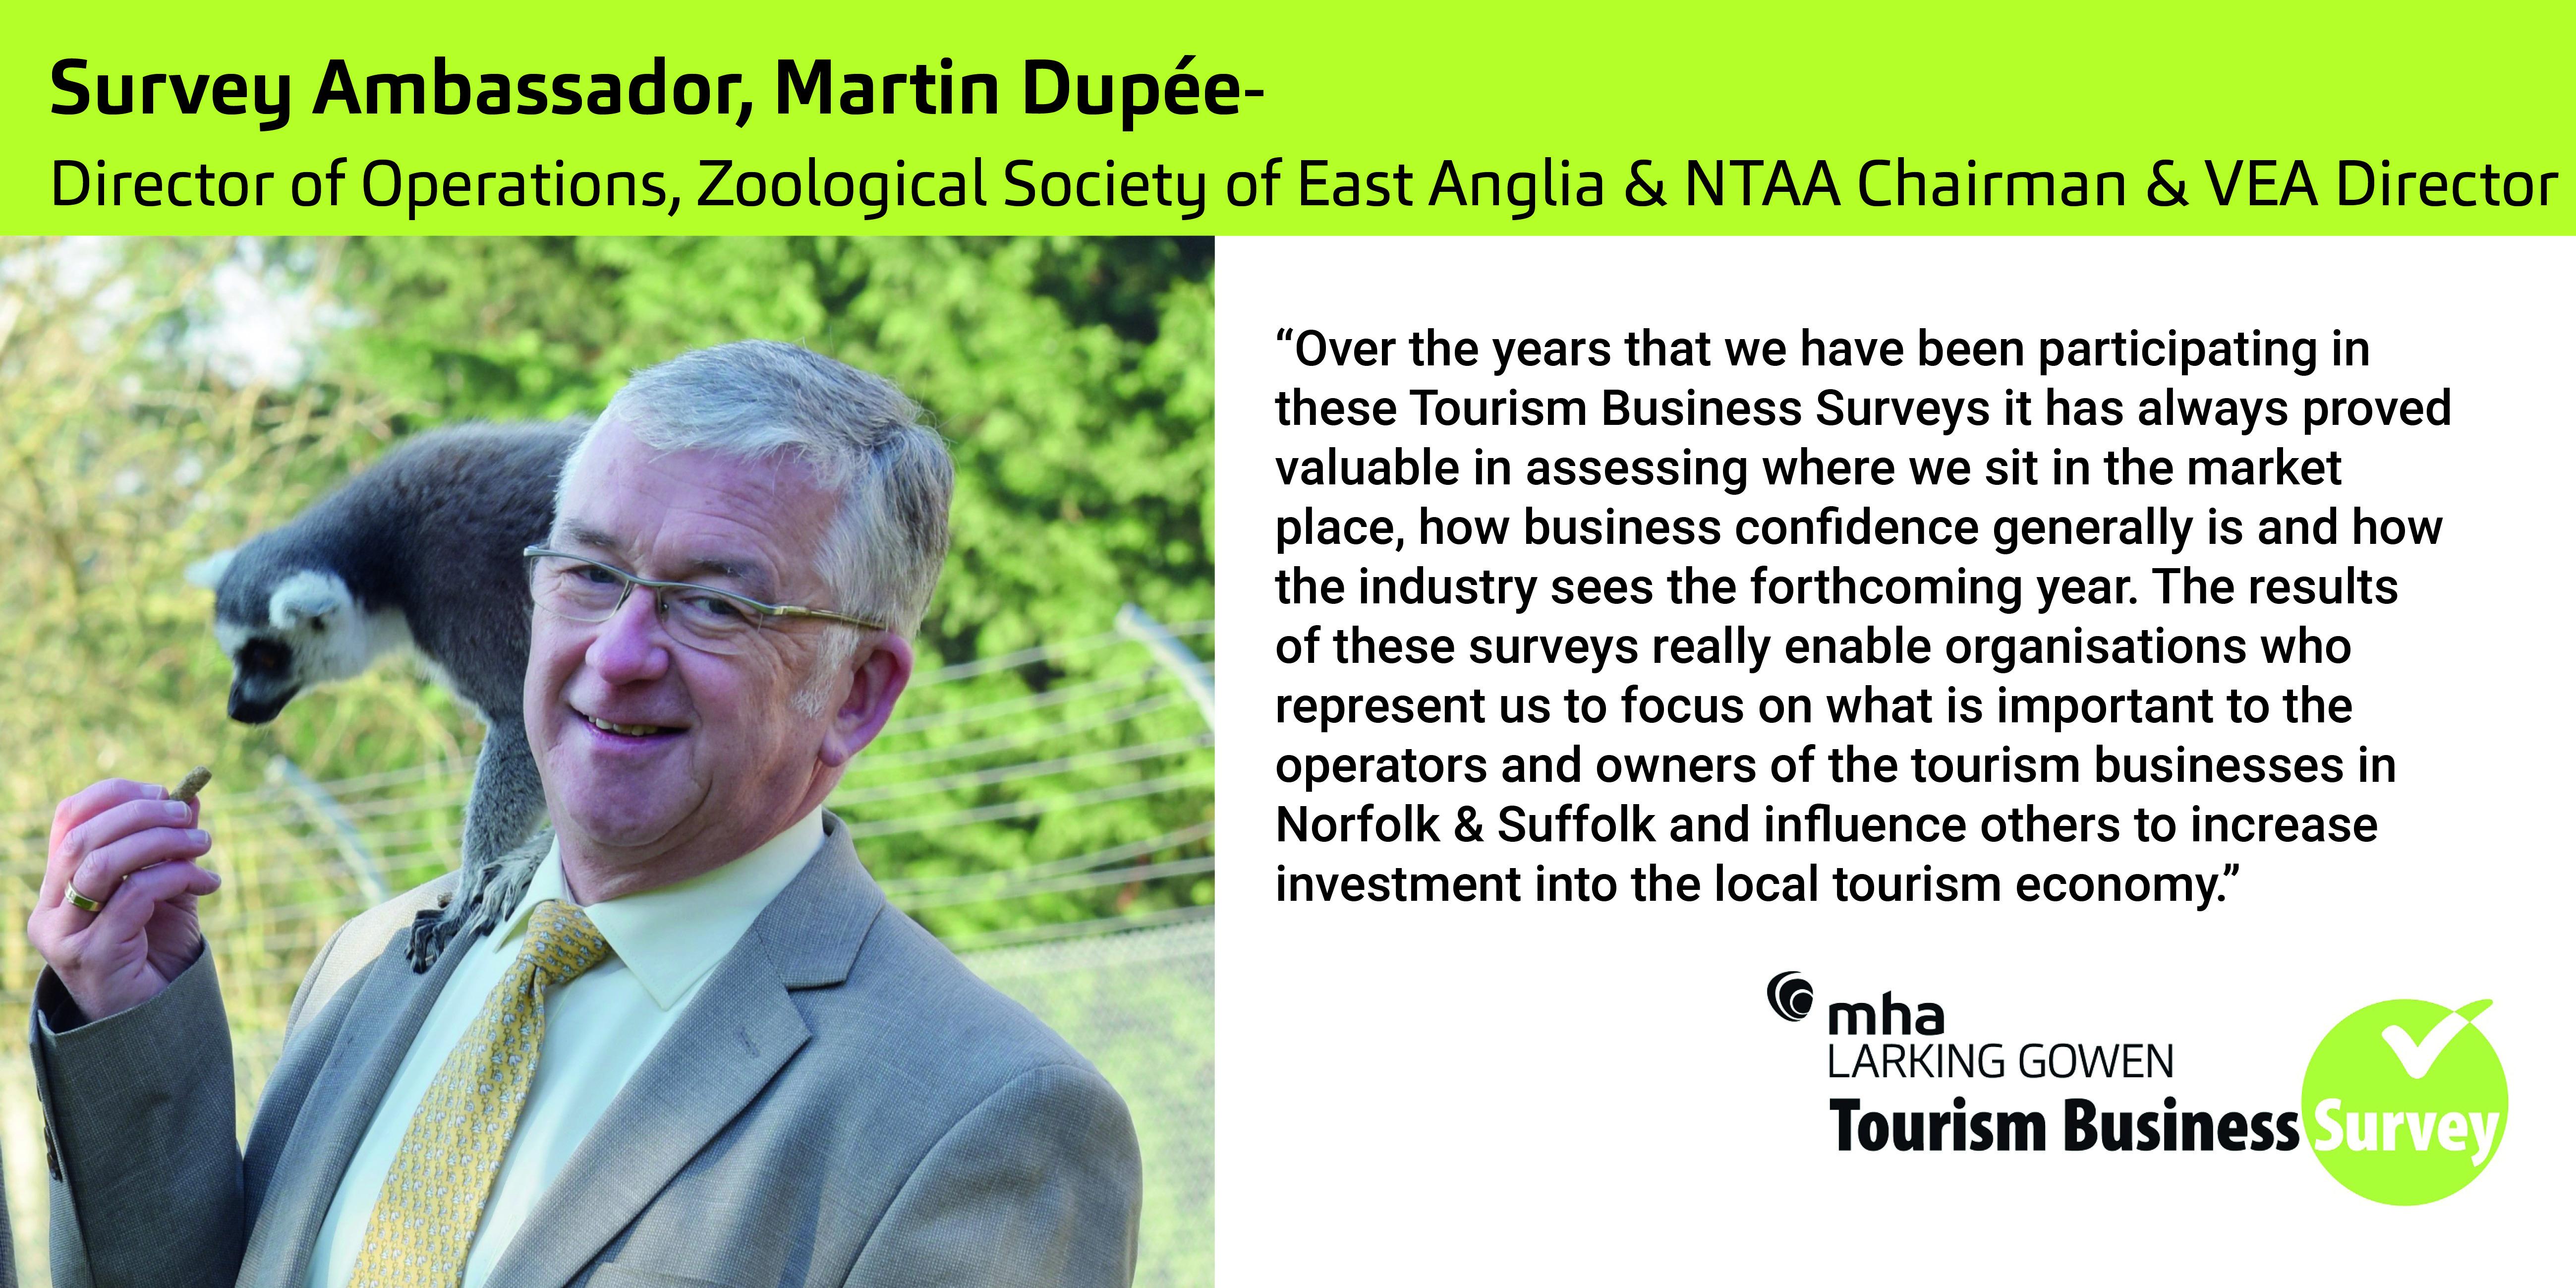 Survey-ambassedor-slide-Martin-Dupee